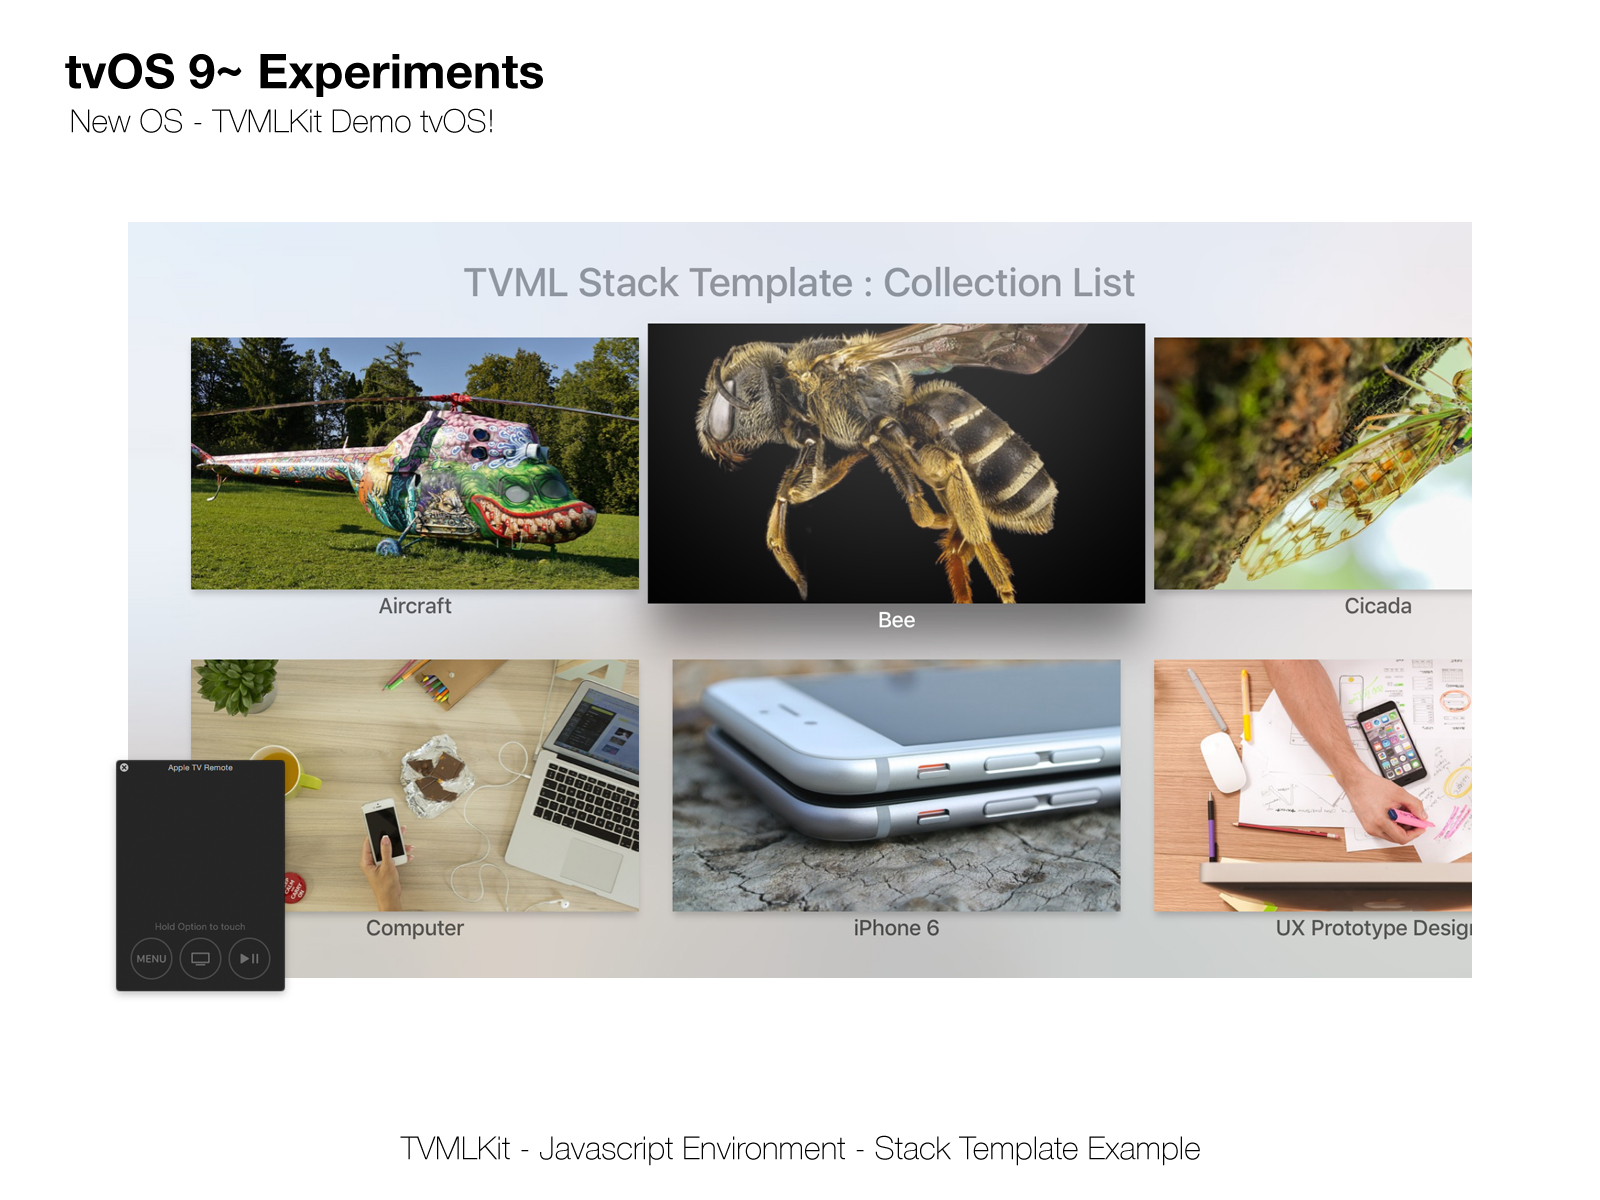 GitHub - Sweefties/tvOS9-TVMLKitDemo: tvOS 9 - Experiments